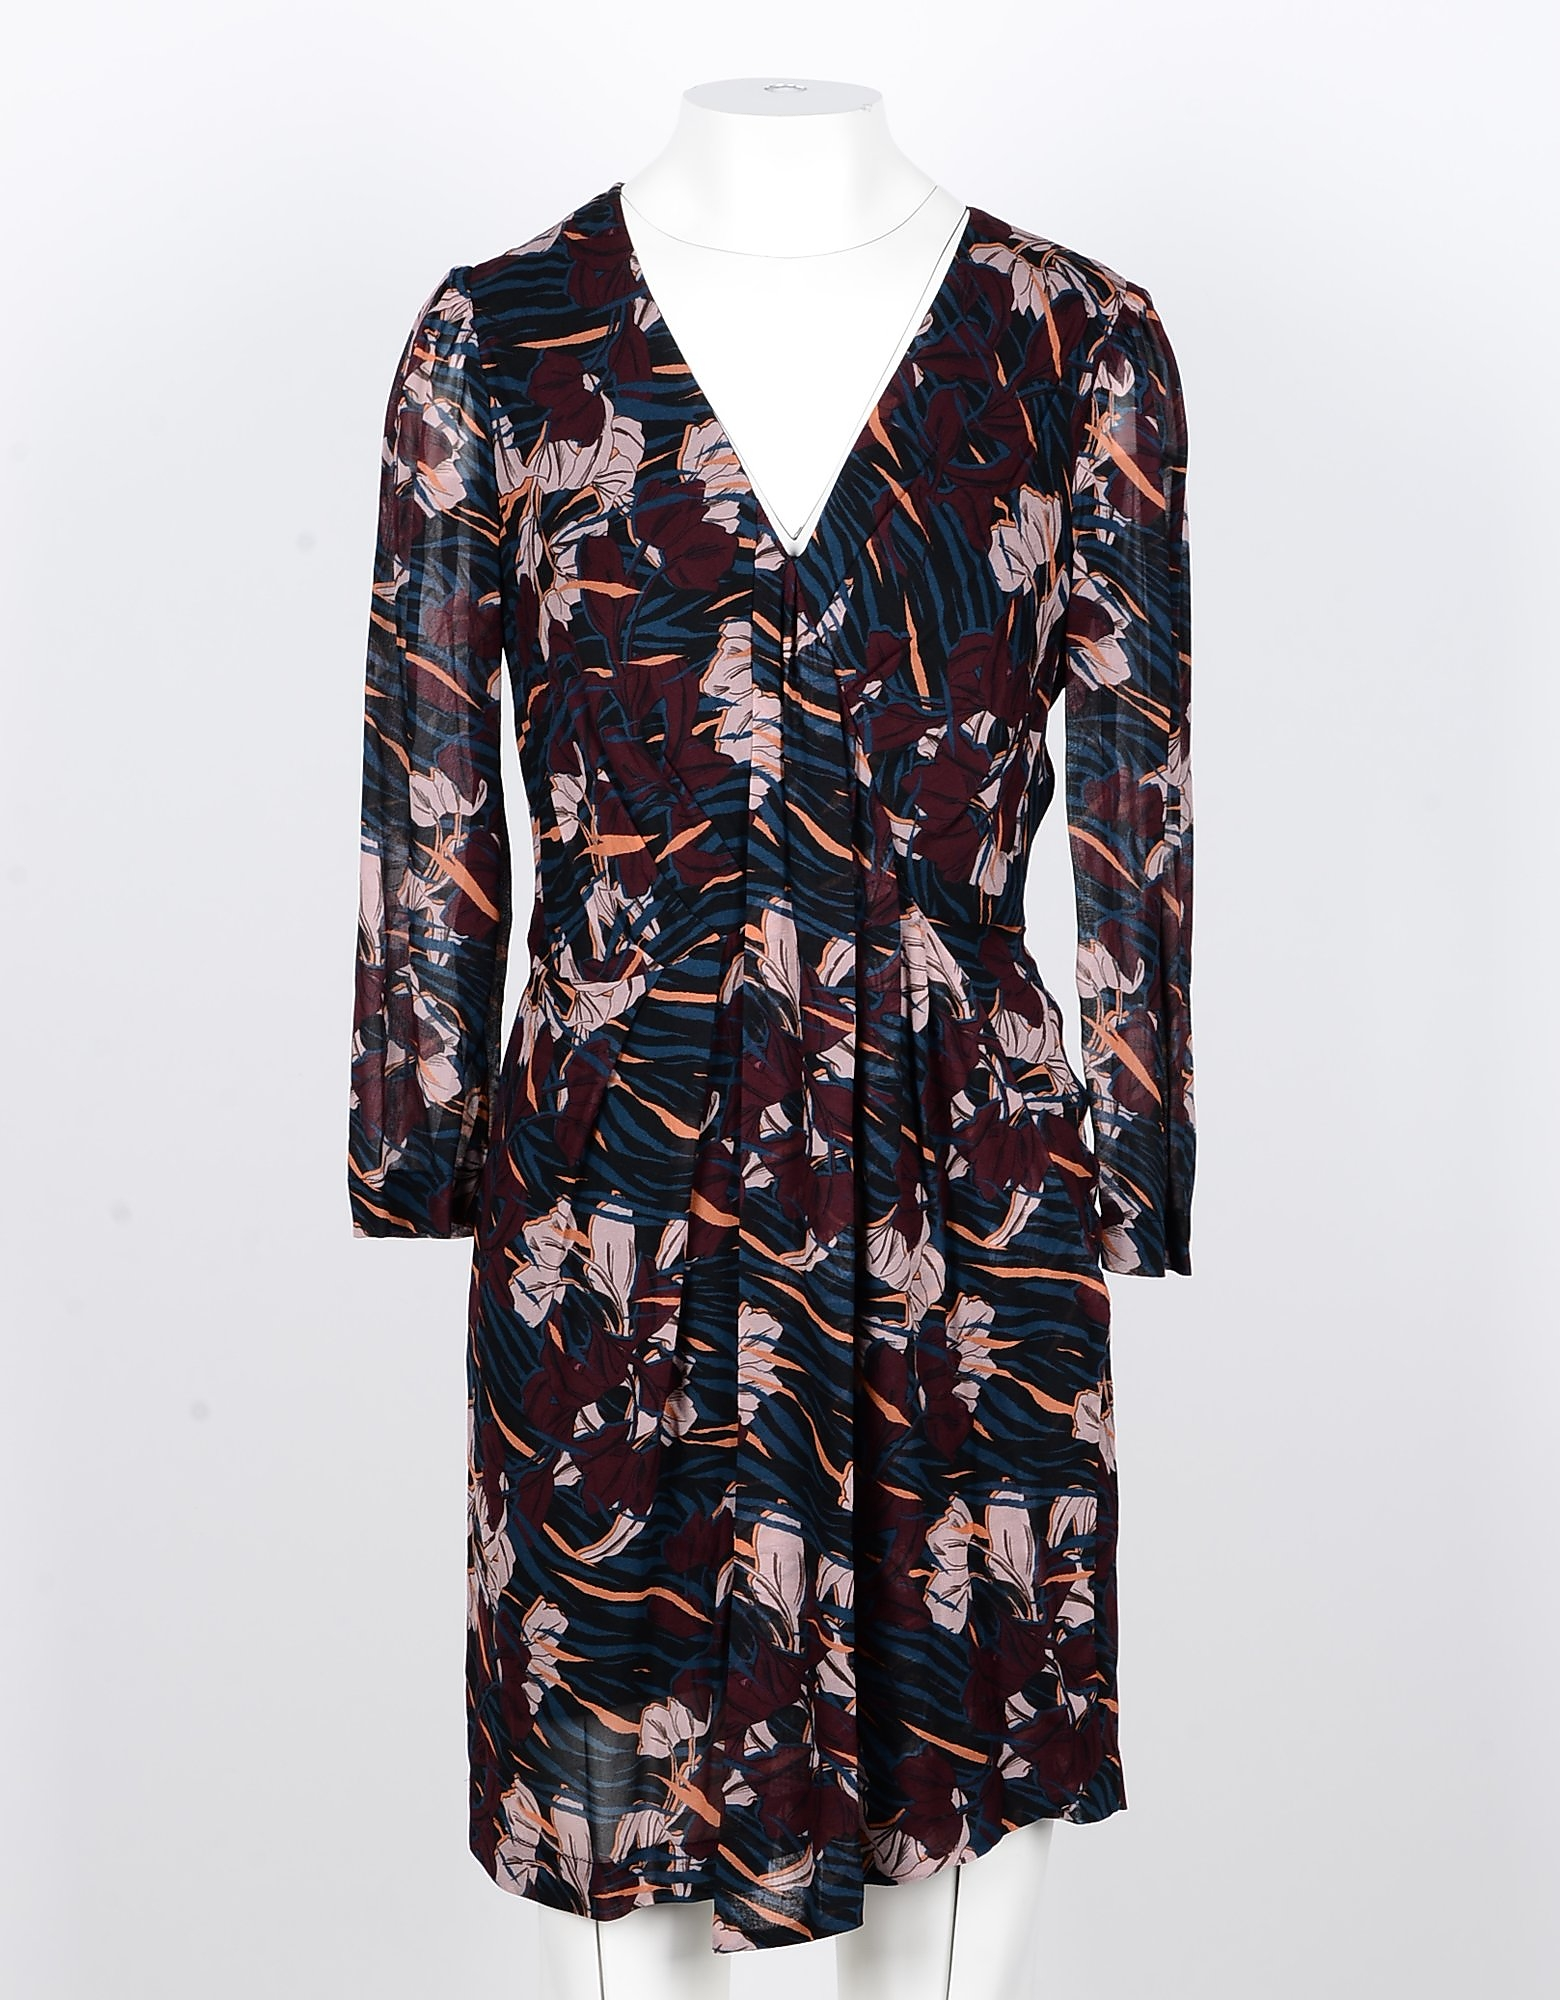 Annarita N Designer Dresses & Jumpsuits, Floral Printed Viscose Women's Dress